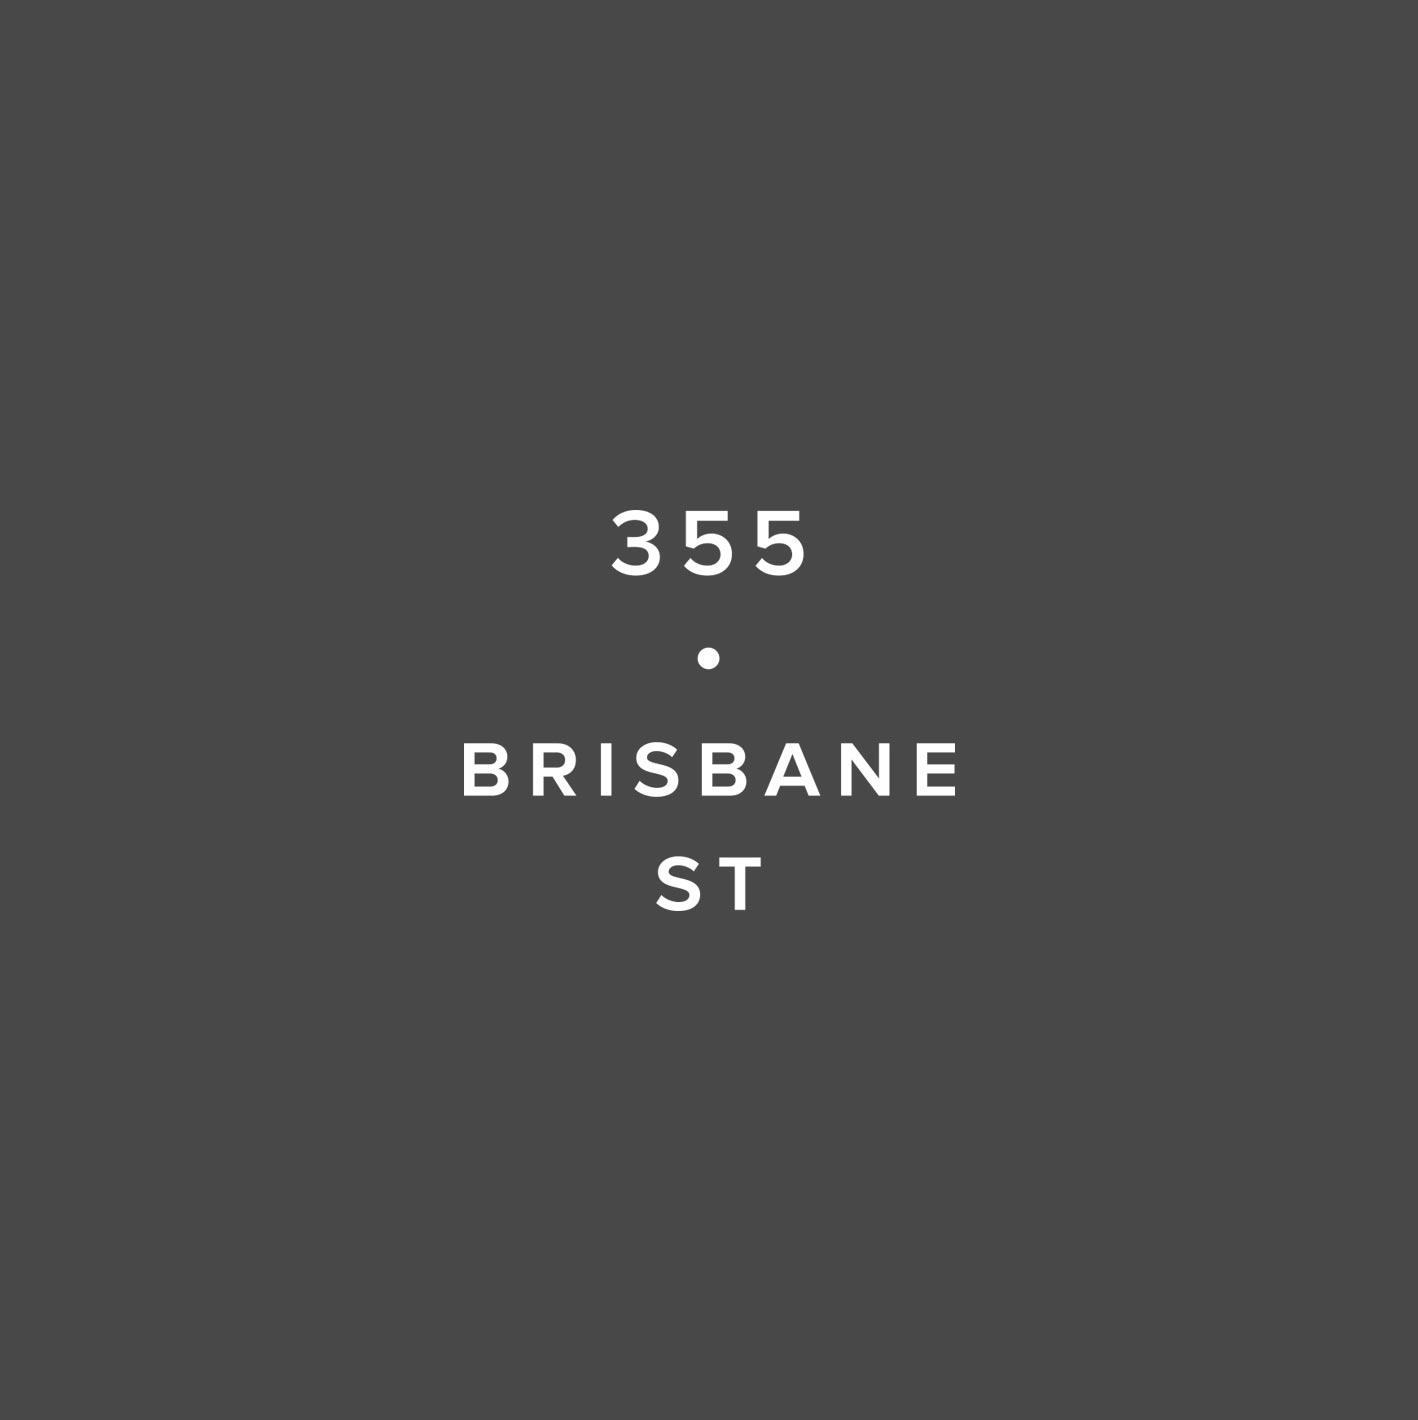 Synergy-Property-242-Brisbane-st-1a.jpg